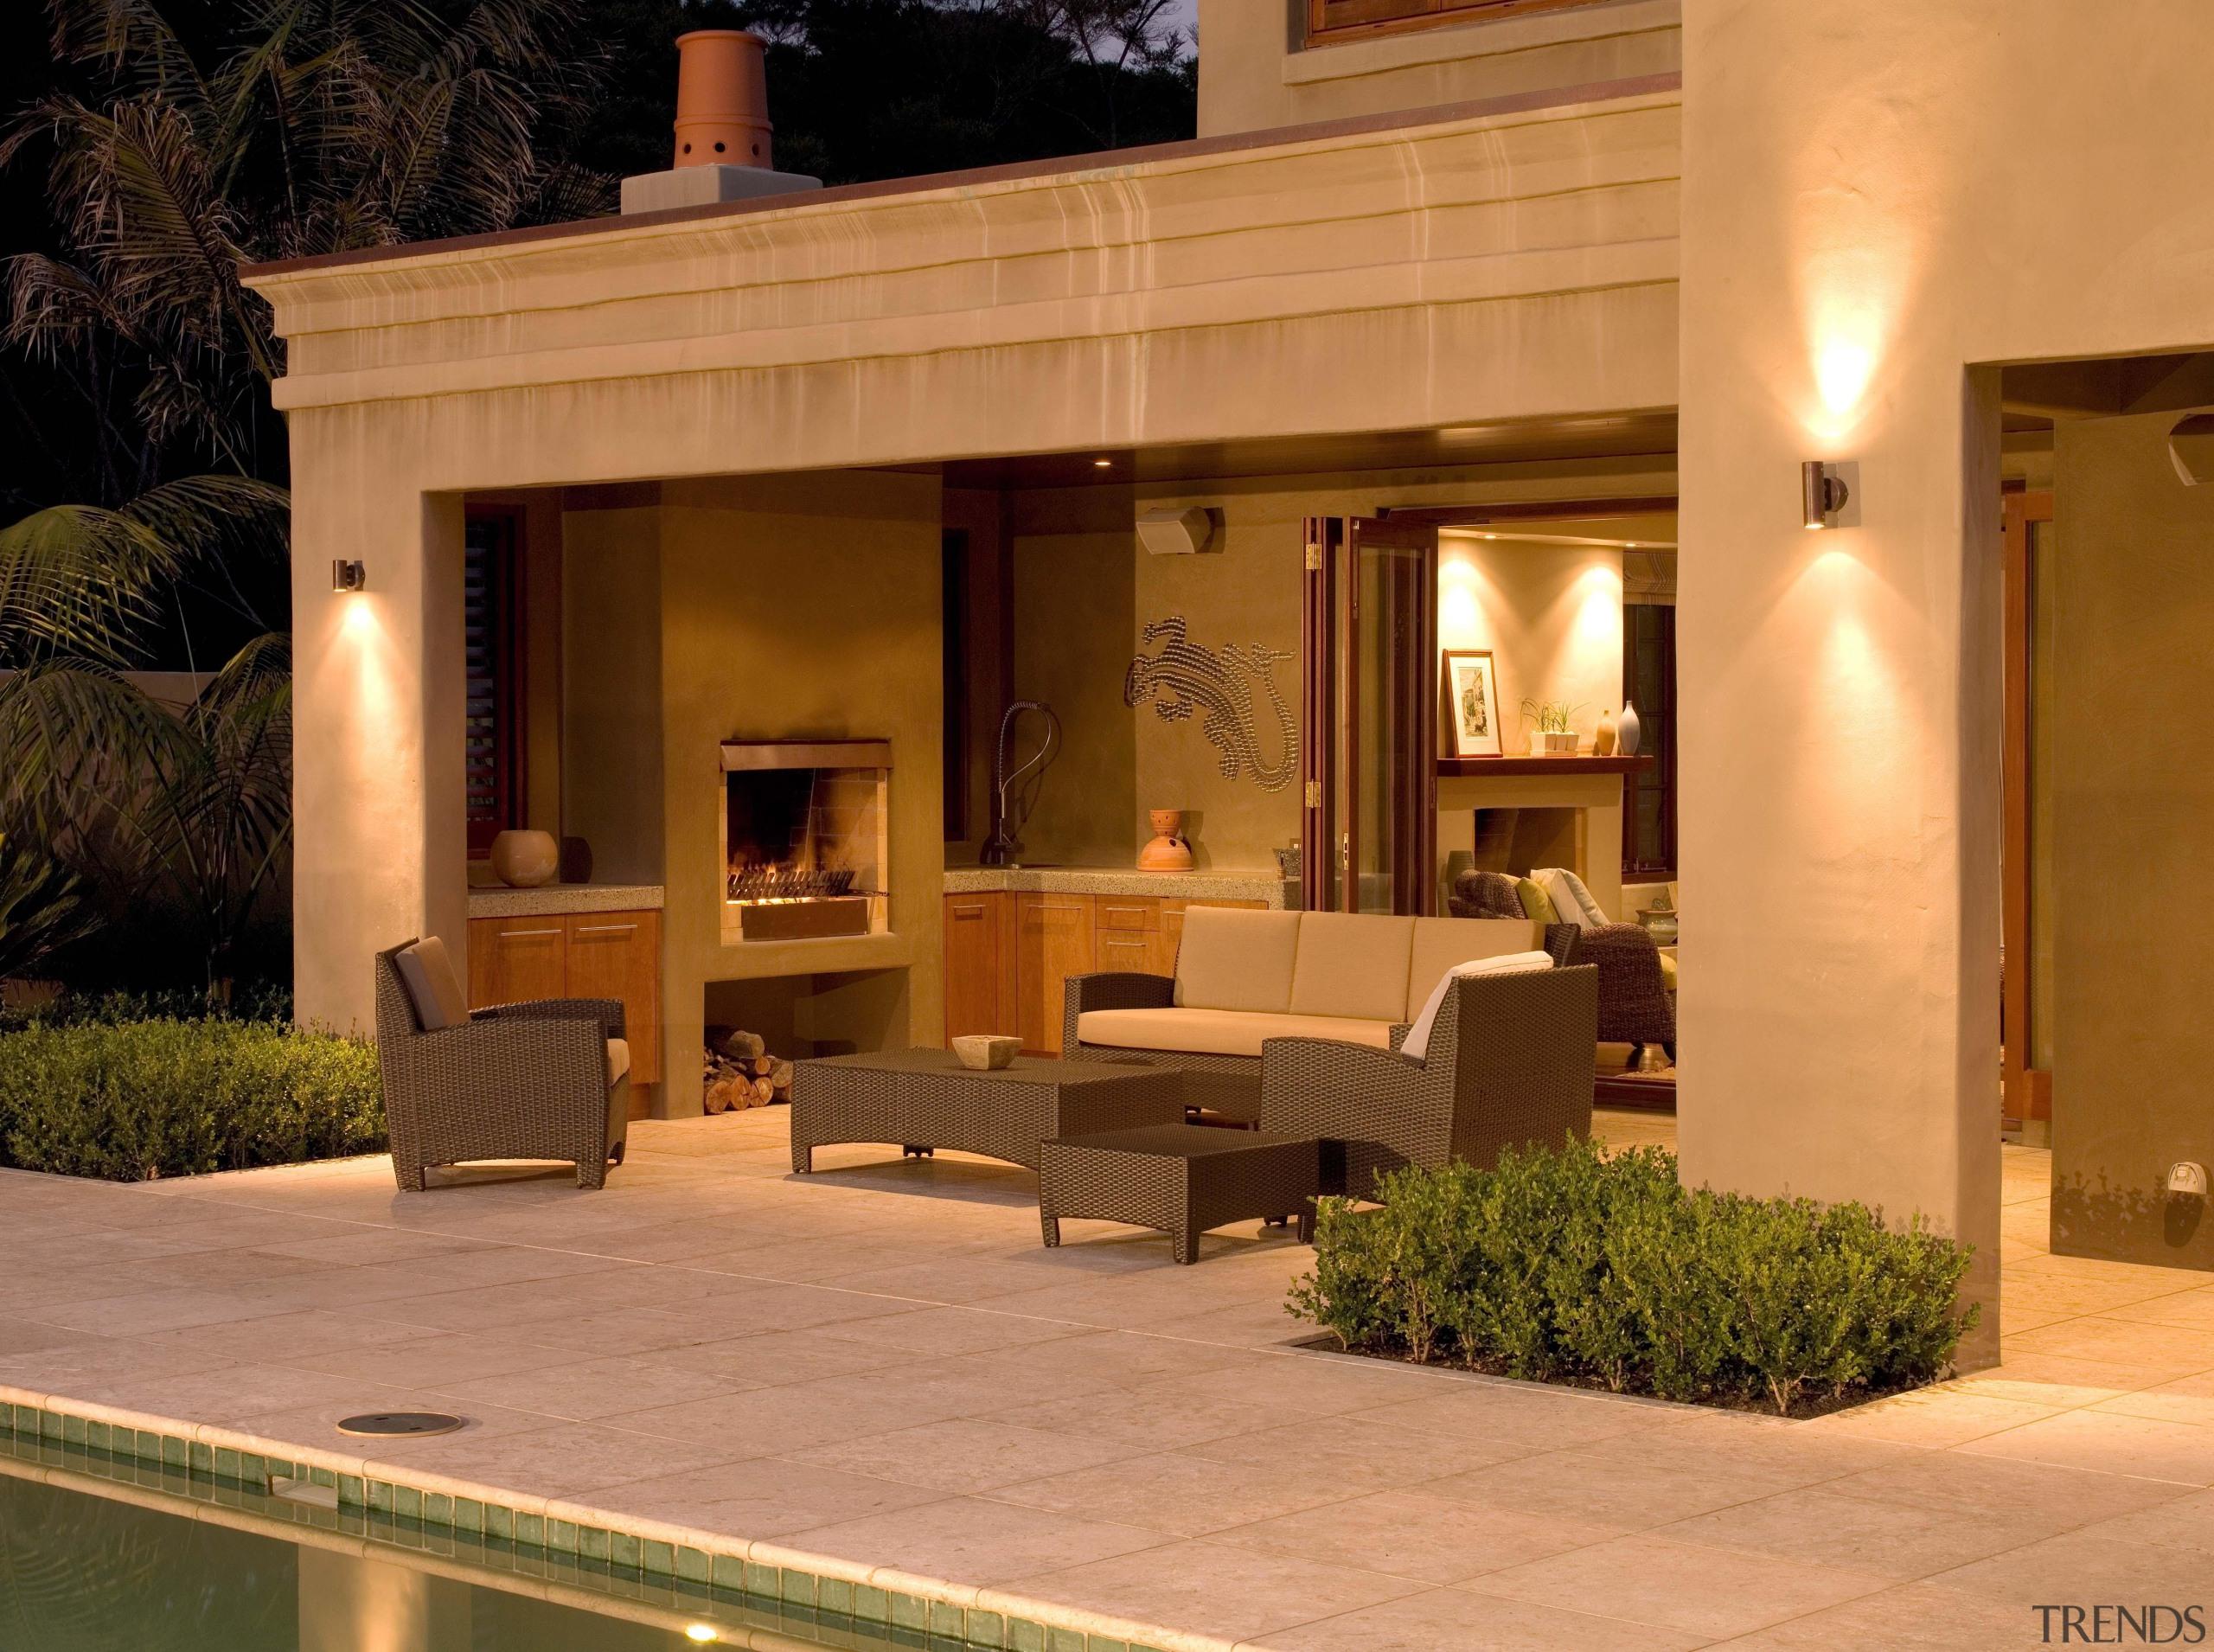 139 Onetaunga 19 - Onetaunga 19 - furniture furniture, home, interior design, landscape lighting, lighting, outdoor structure, patio, orange, brown